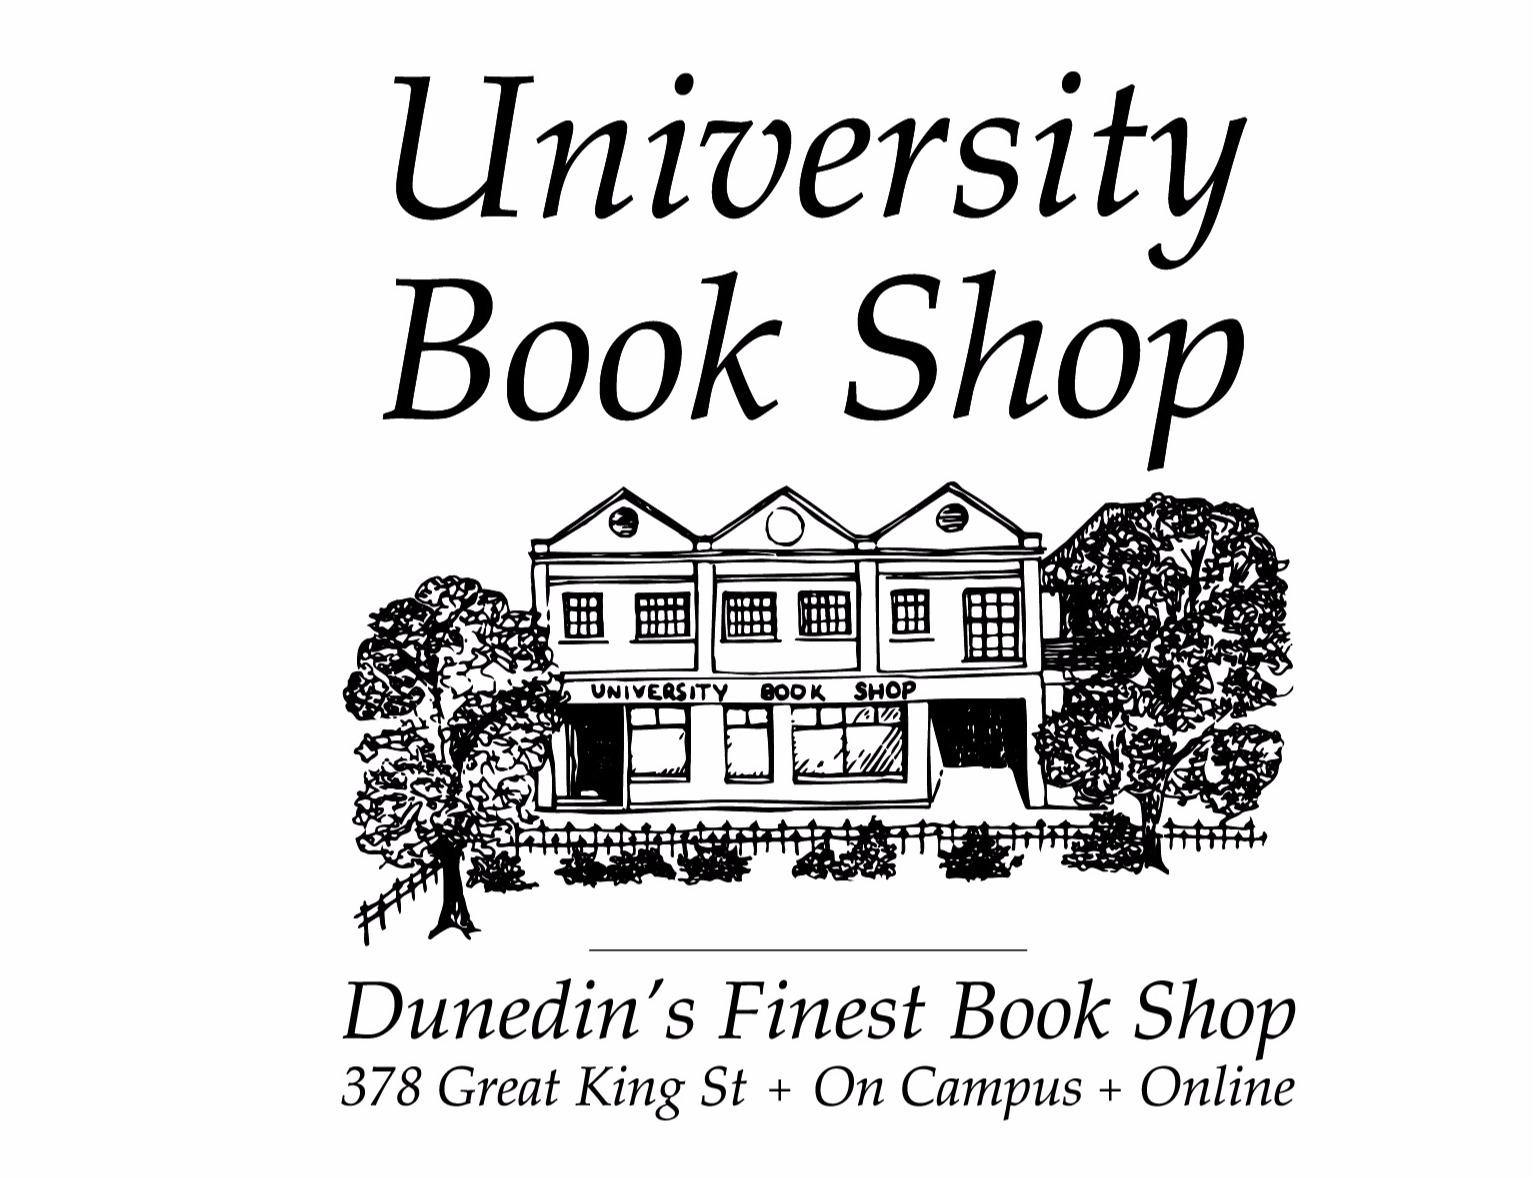 University Book Shop Otago Ltd